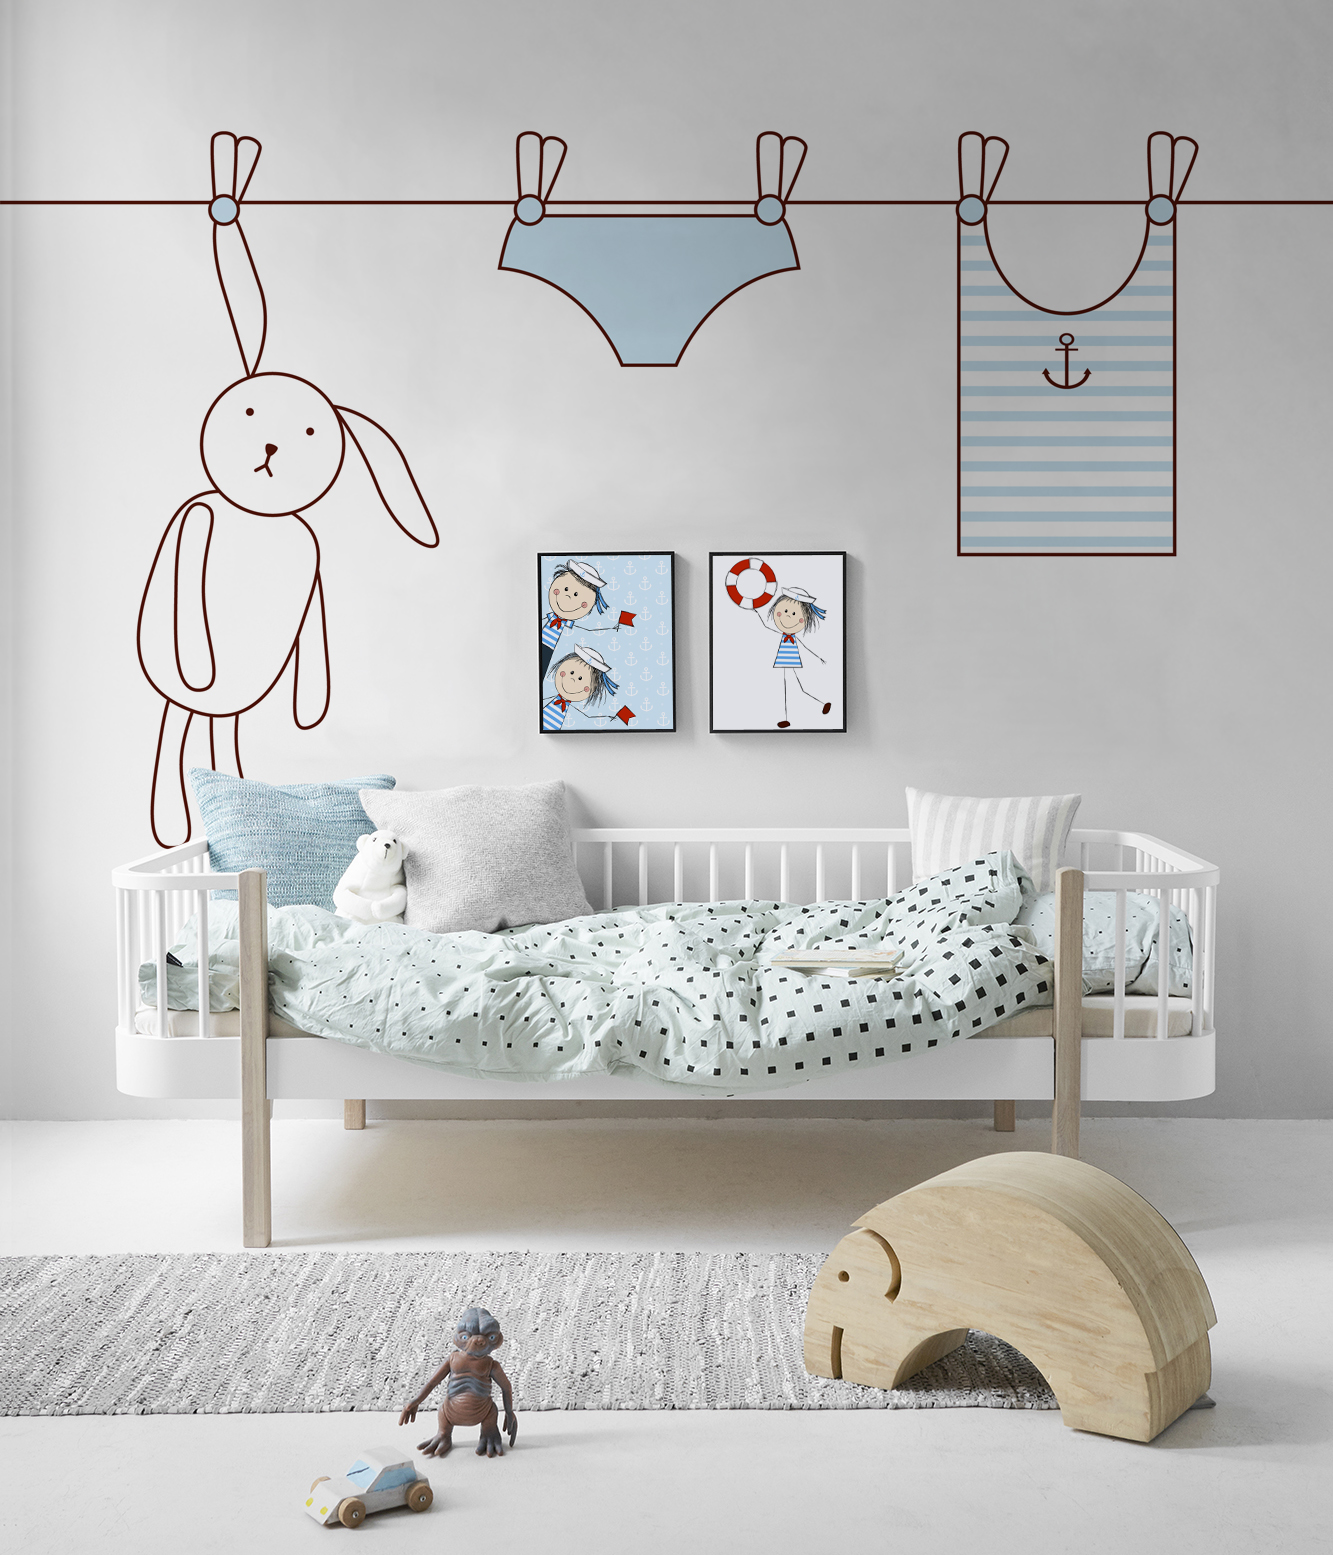 Dream Sailor Scandinavian Kids room Wall Murals Posters